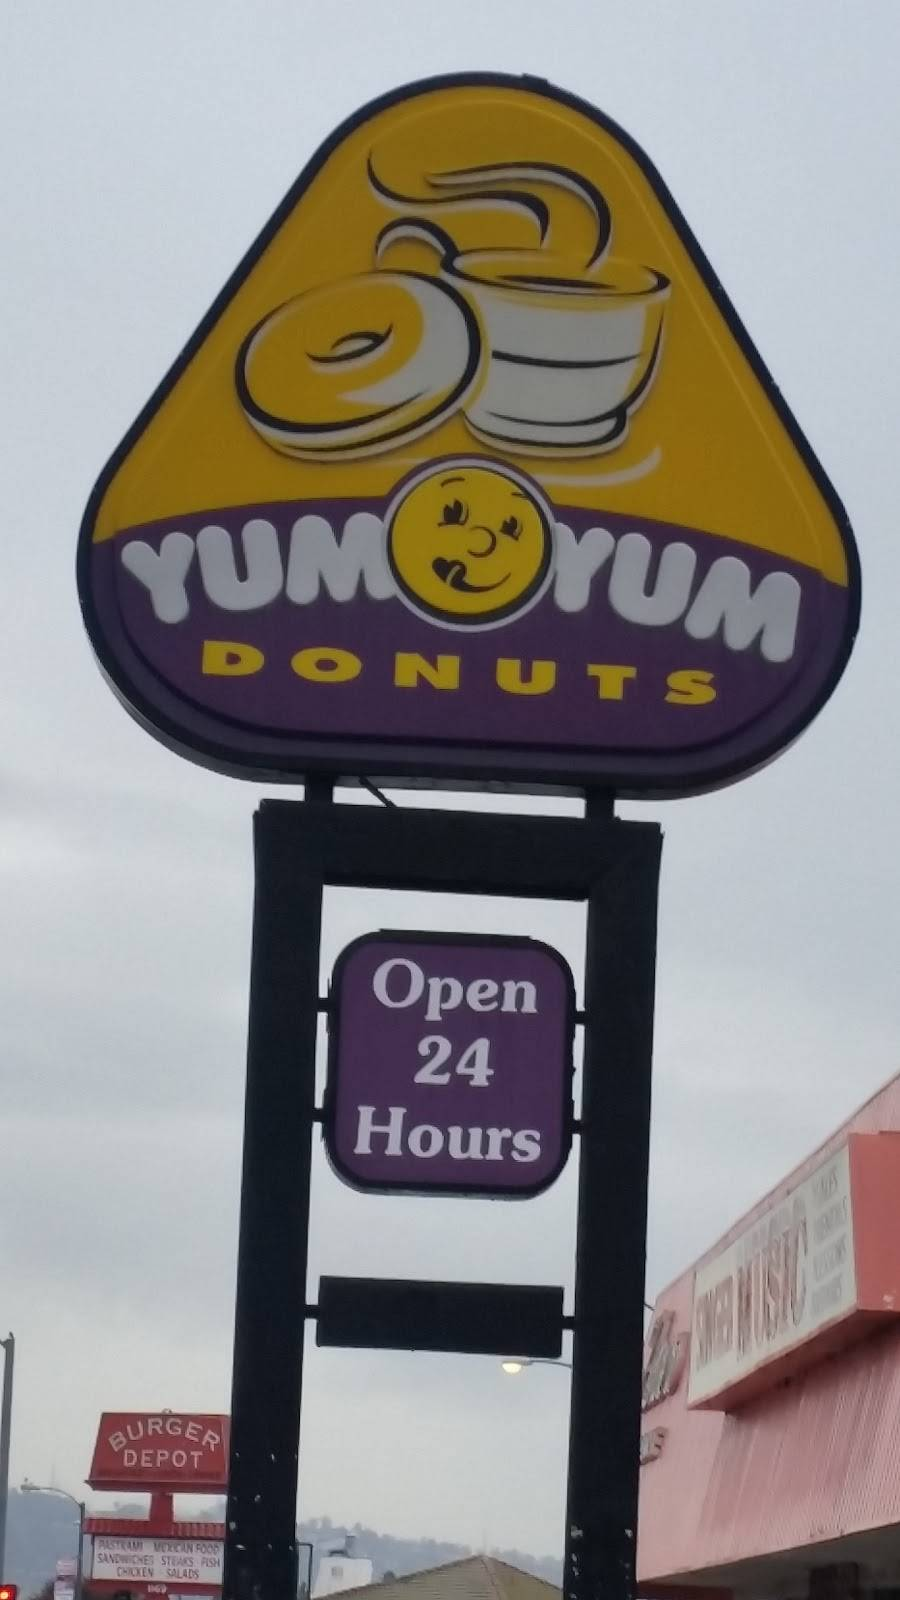 Yum Yum Donuts | cafe | 1225 N Hacienda Blvd, La Puente, CA 91744, USA | 6269179251 OR +1 626-917-9251